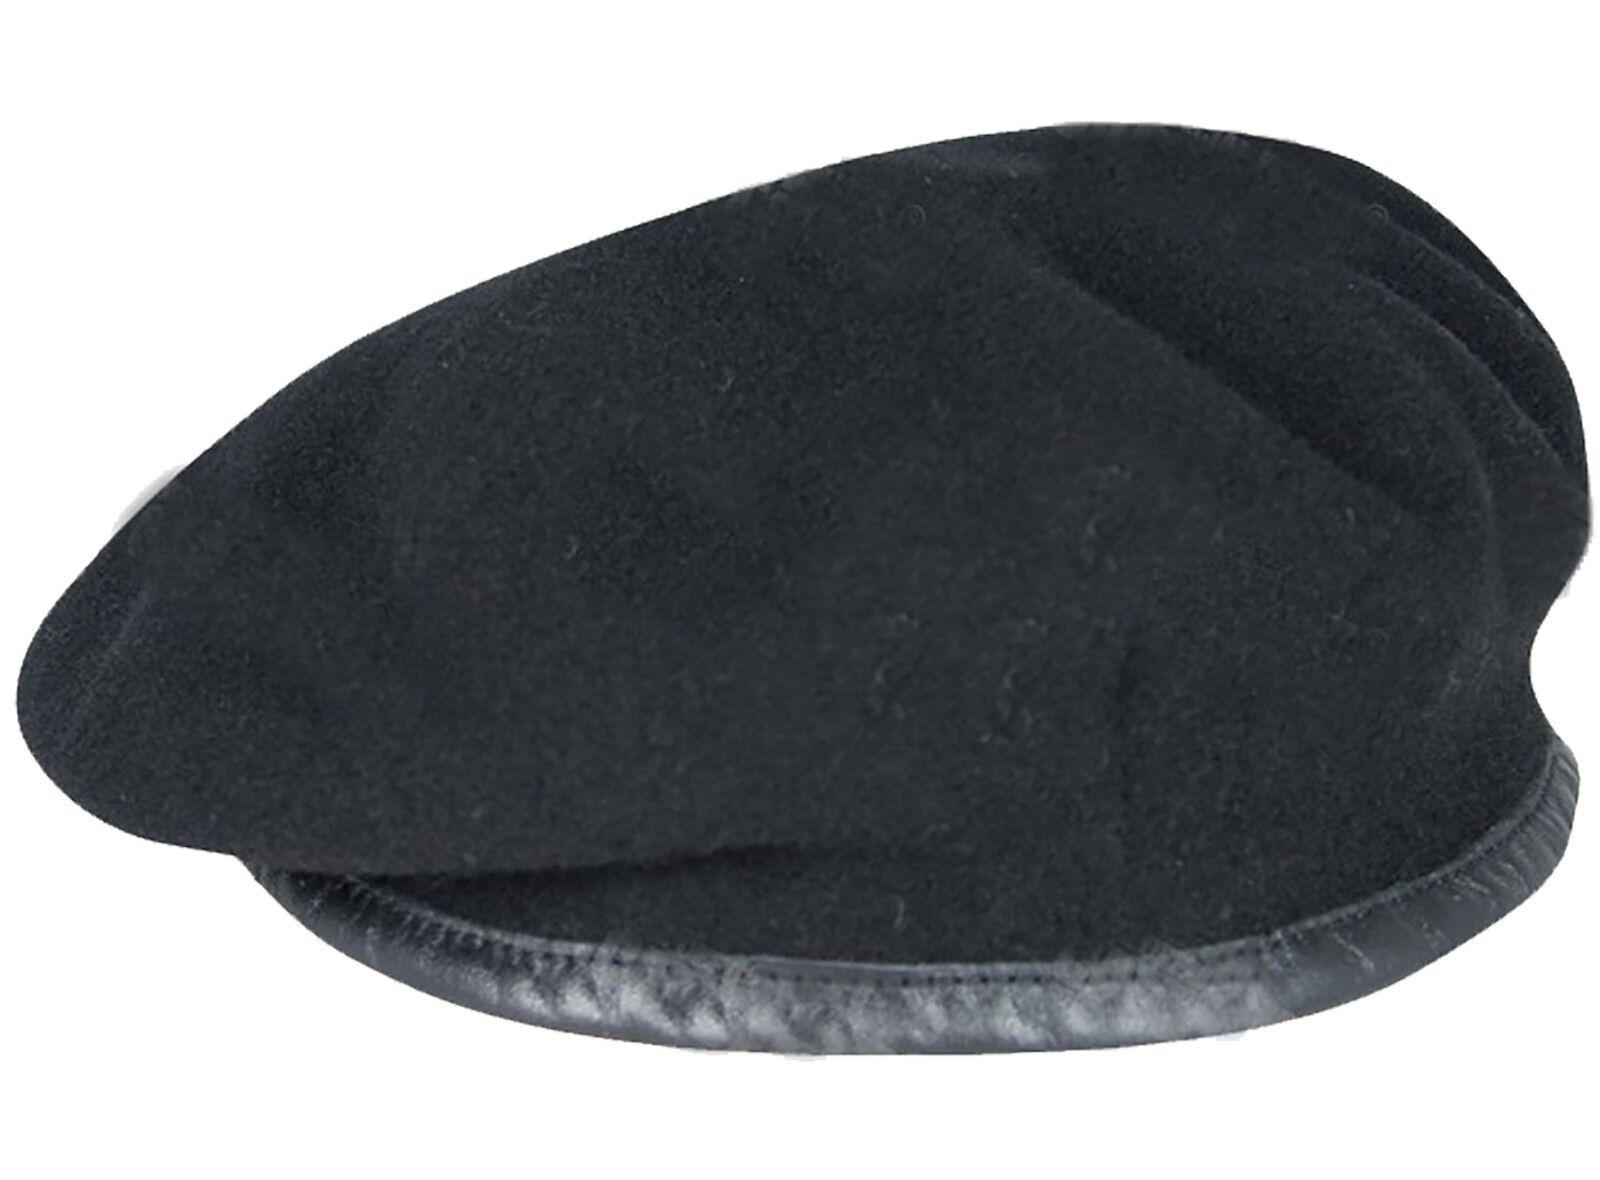 MILITARY CAP HAT = XS S M L XL NEW 100/% WOOL MENS BERET REAL LEATHER TRIM